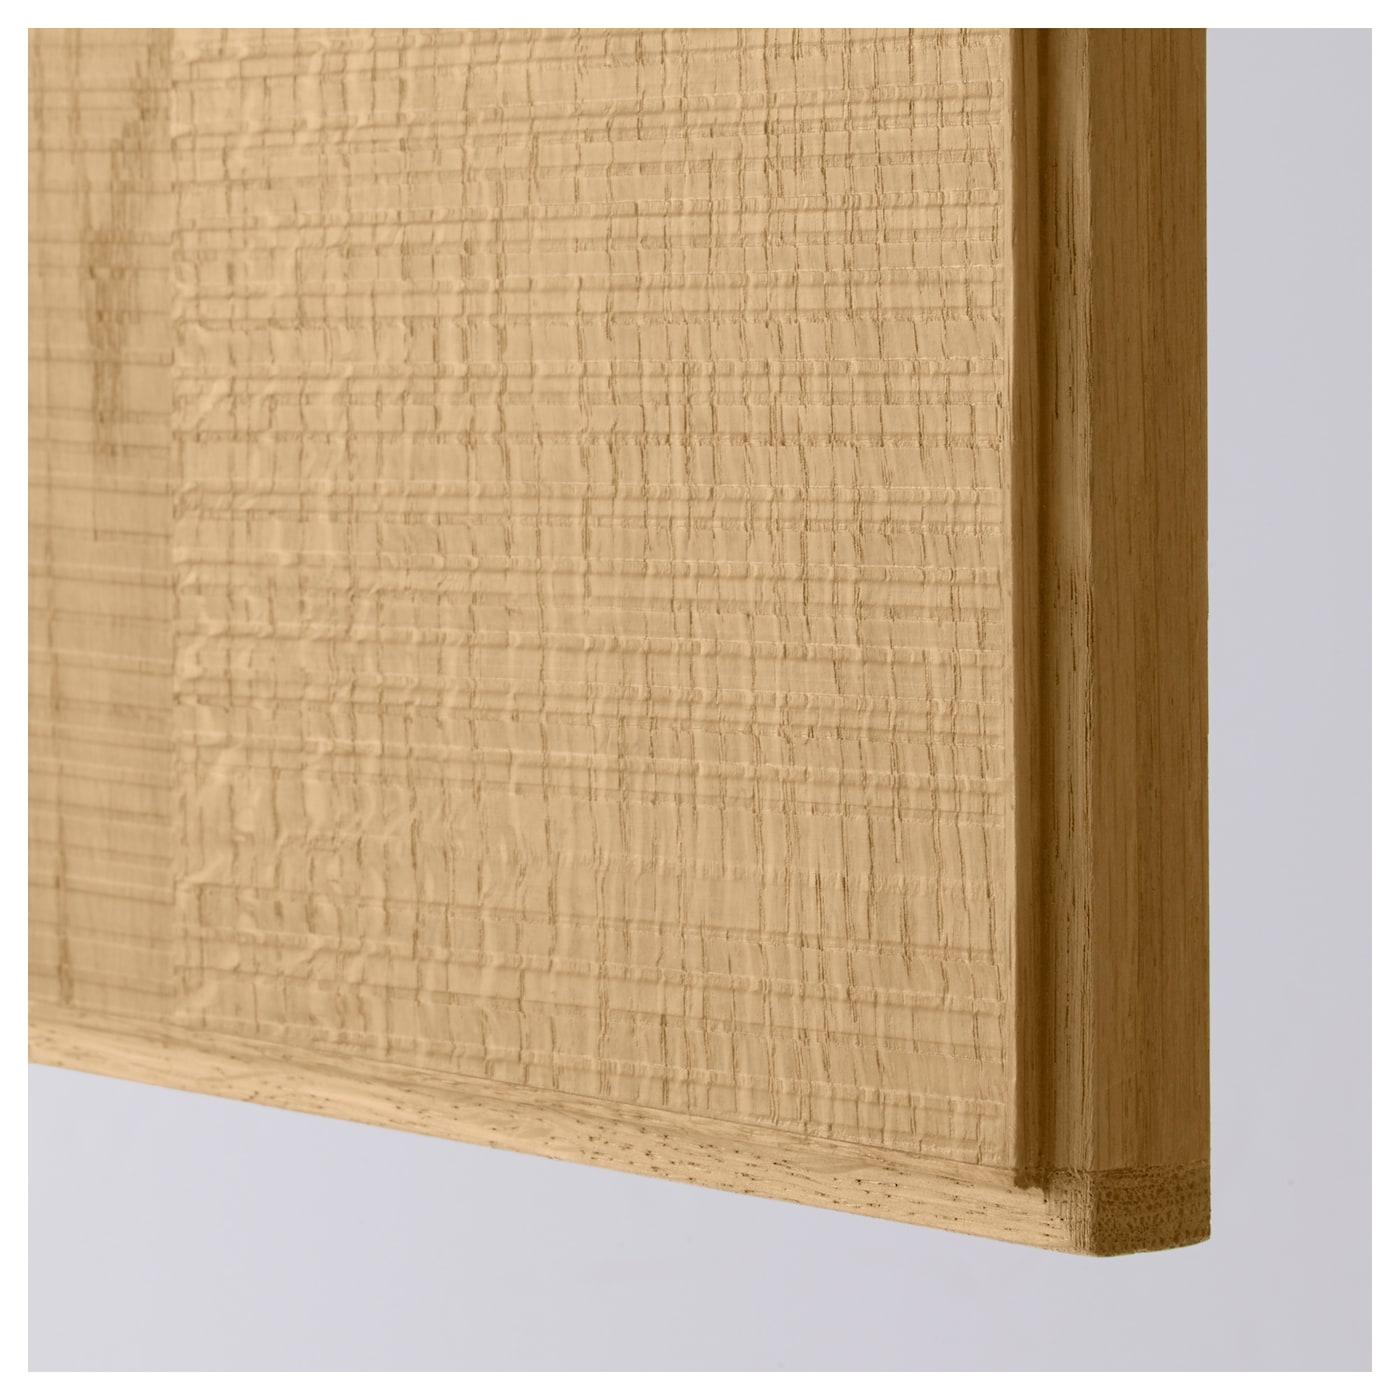 HYTTAN Door Oak veneer 60×80 cm  IKEA -> Kuchnie Ikea Hyttan